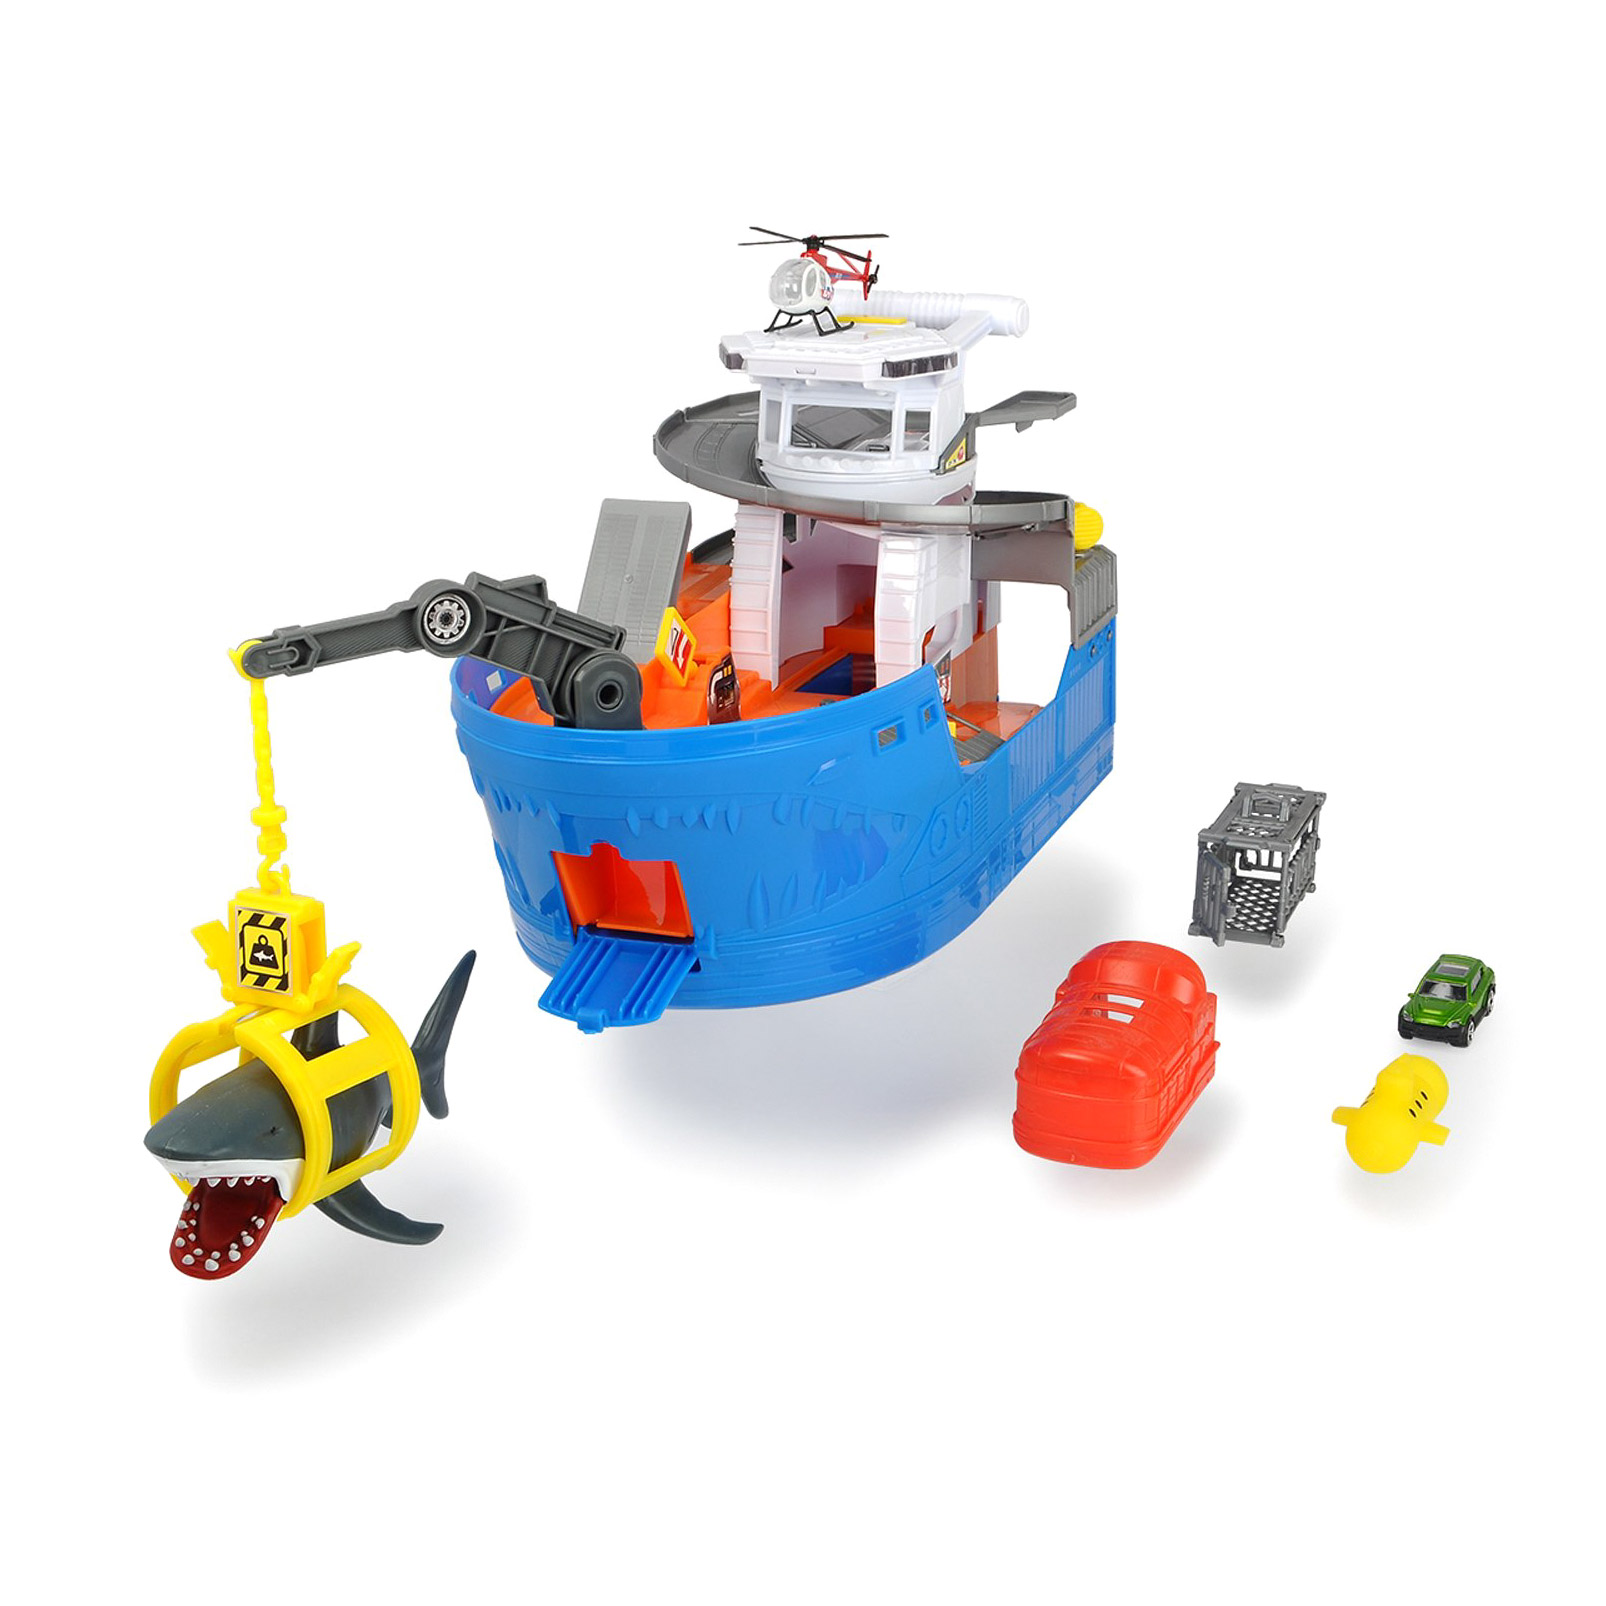 Набор игровой Dickie Toys Атака акулы 50 см dickie toys игровой набор dickie toys побег из тюрьмы свет звук